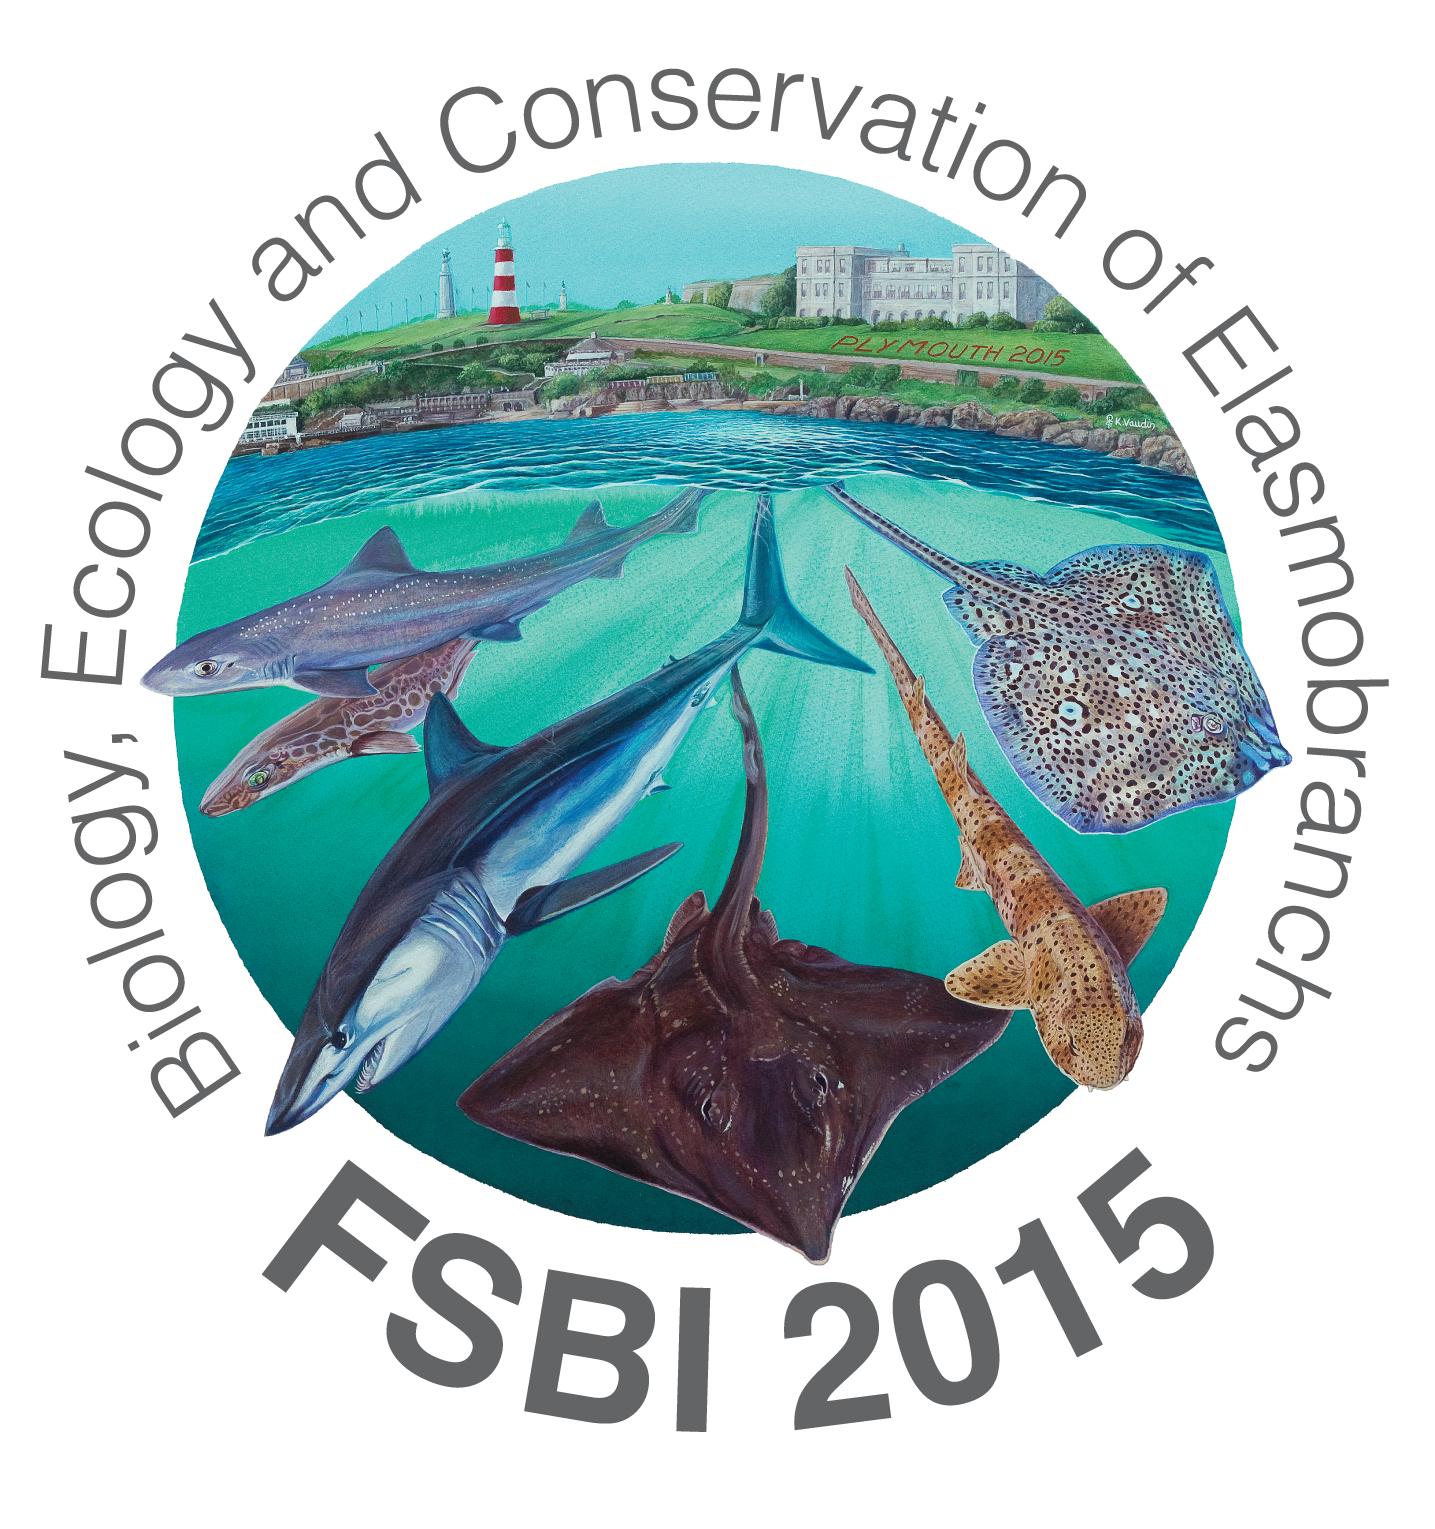 FSBI-2015-symposium